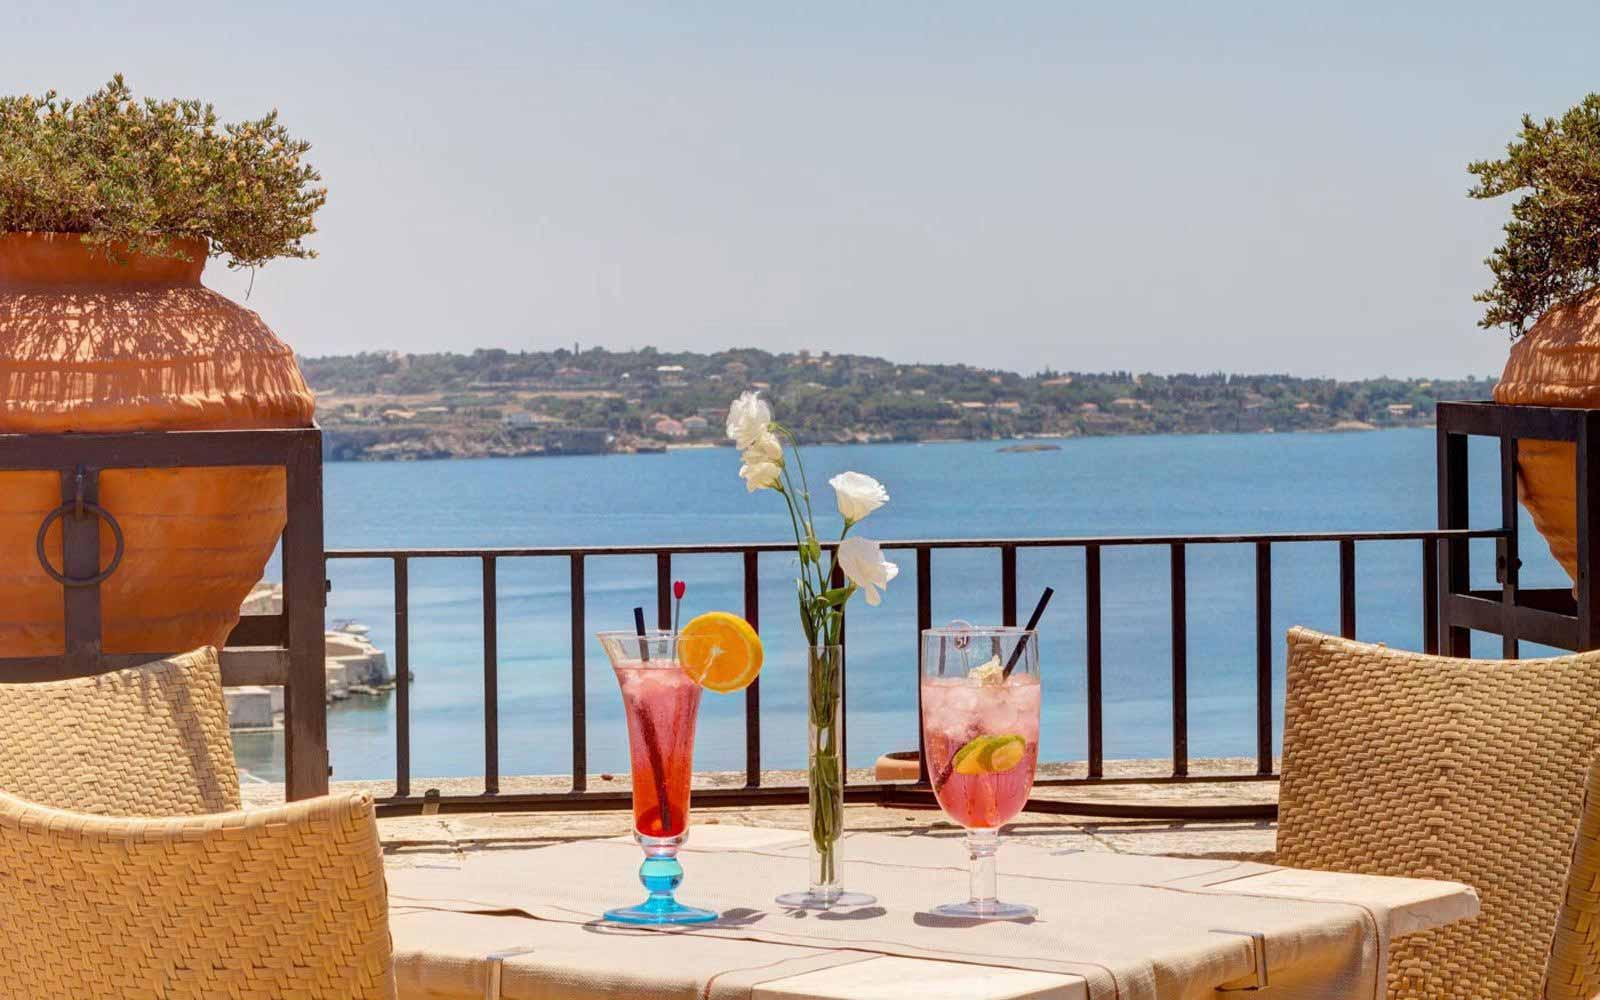 Cocktails on the terrace at Des Etrangers Hotel & Spa et Miramare